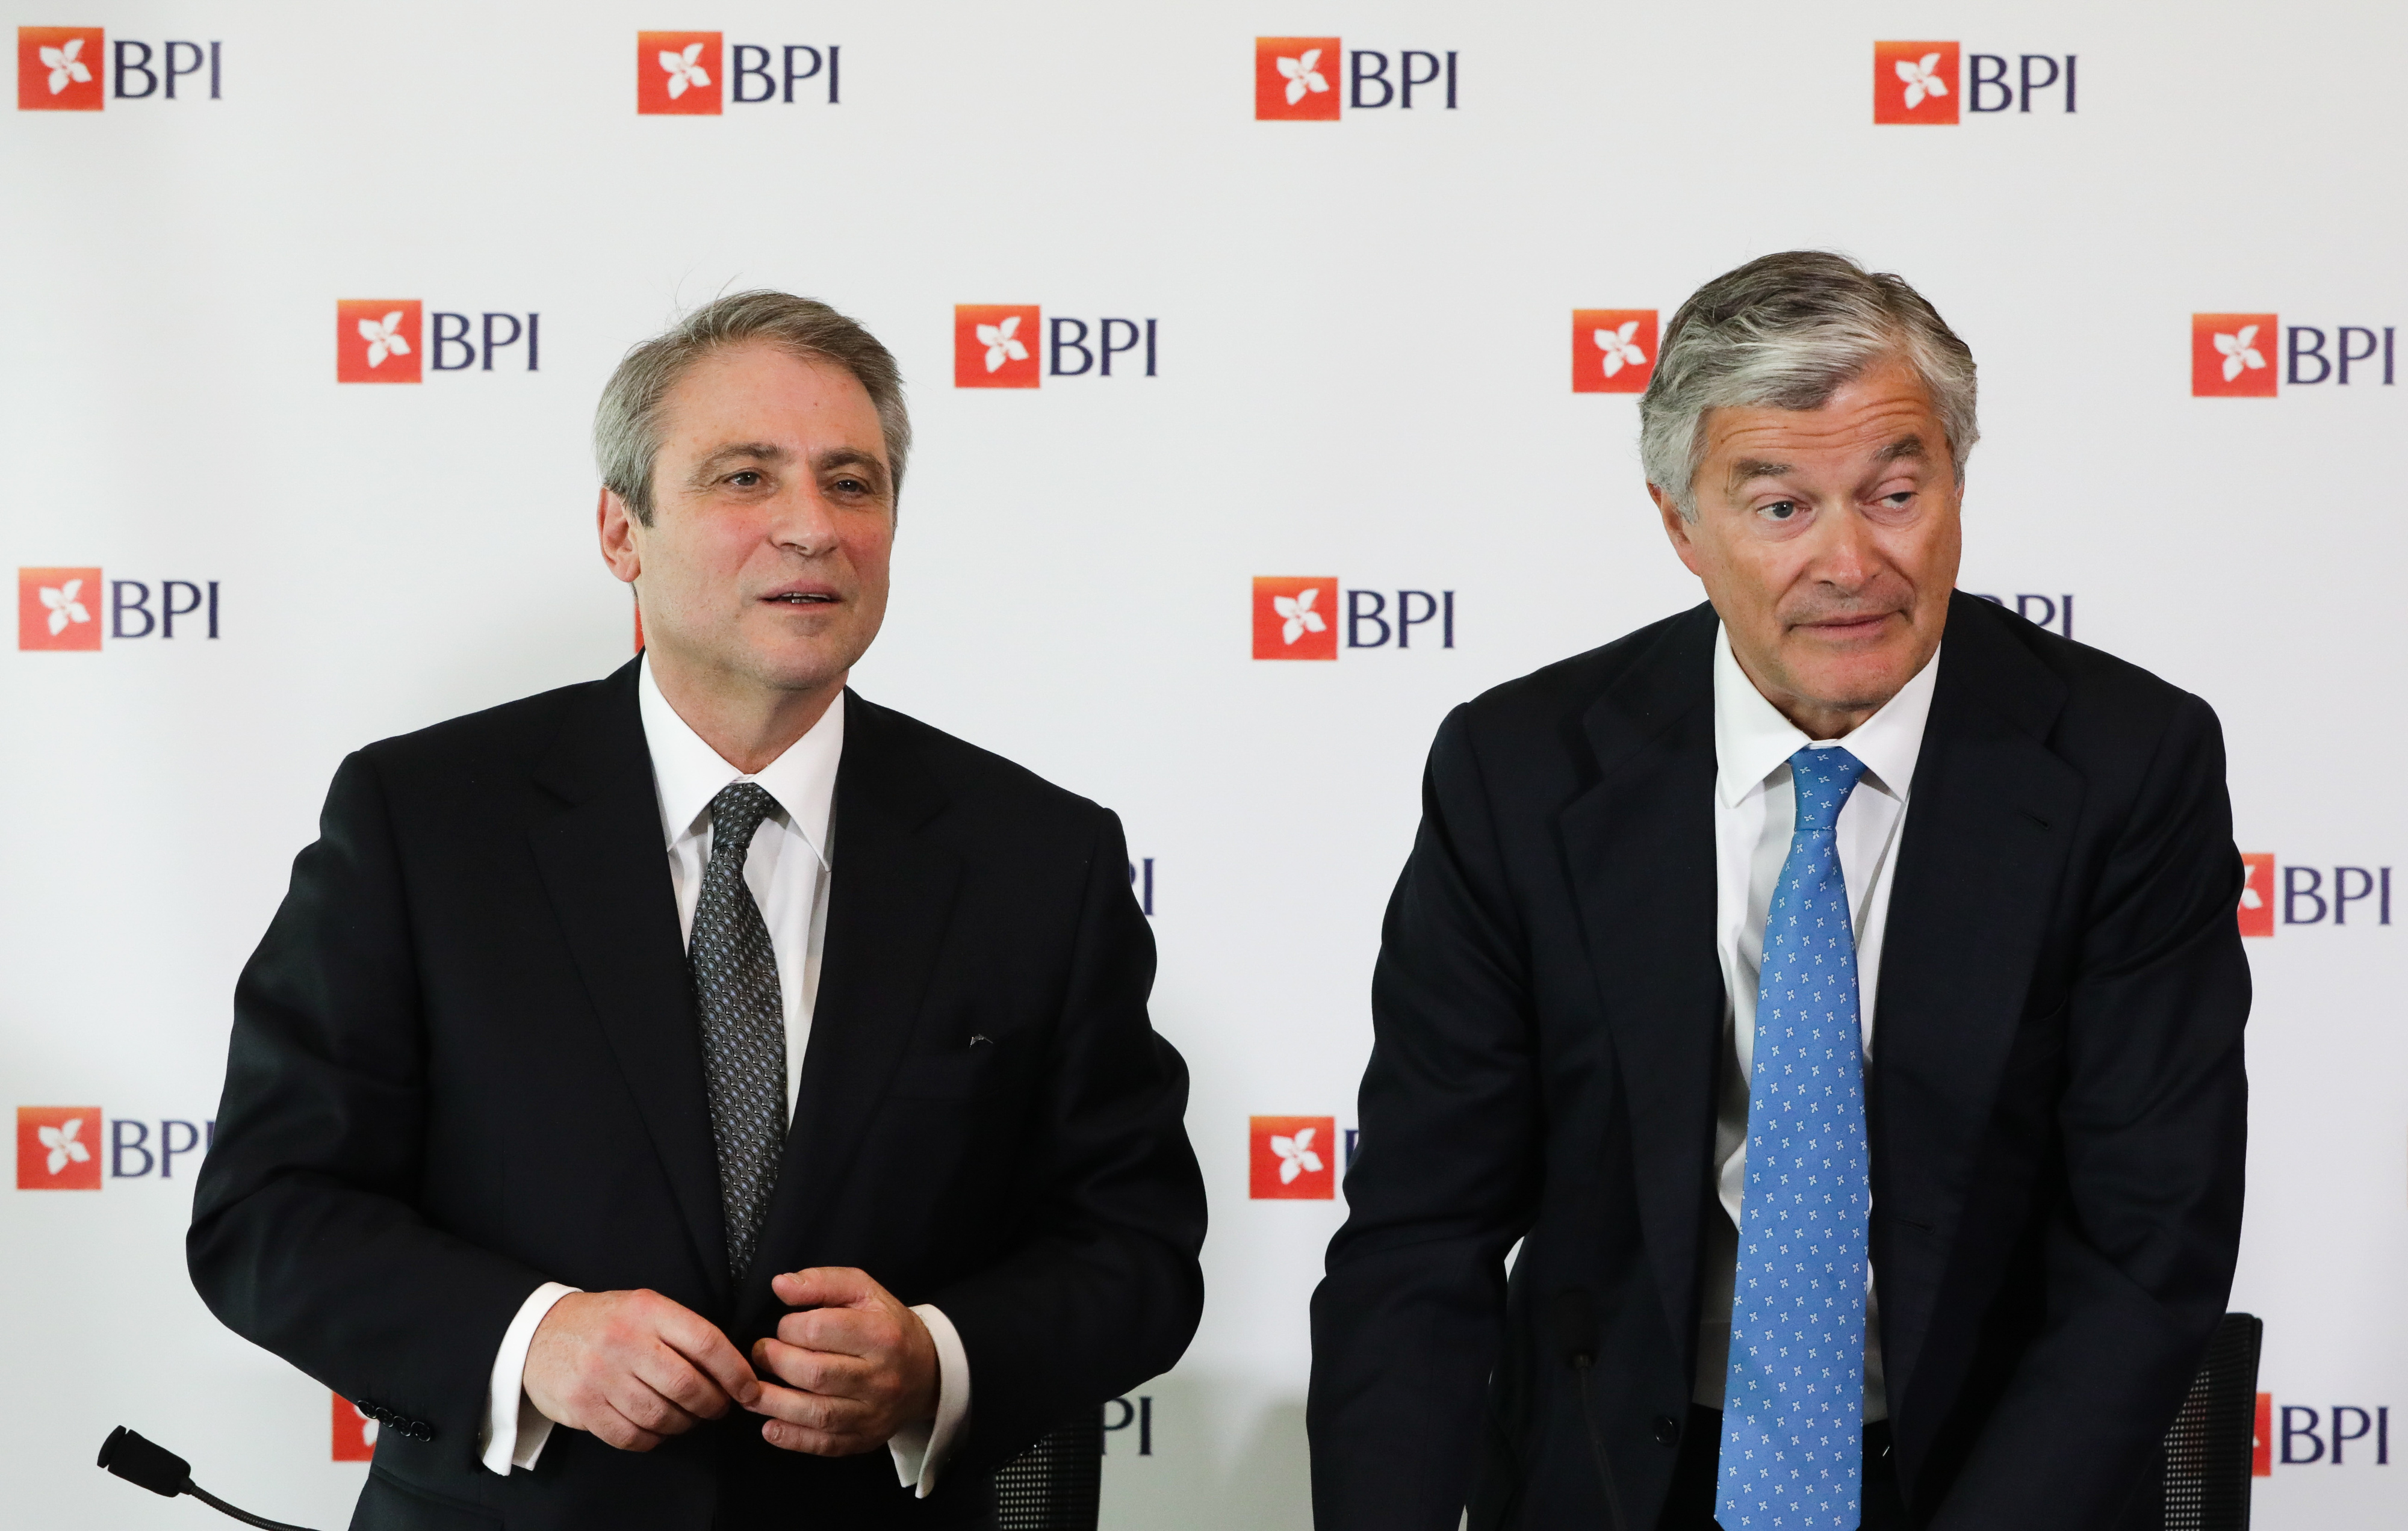 BPI concretizou venda ao CaixaBank de sociedades de fundos de investimento